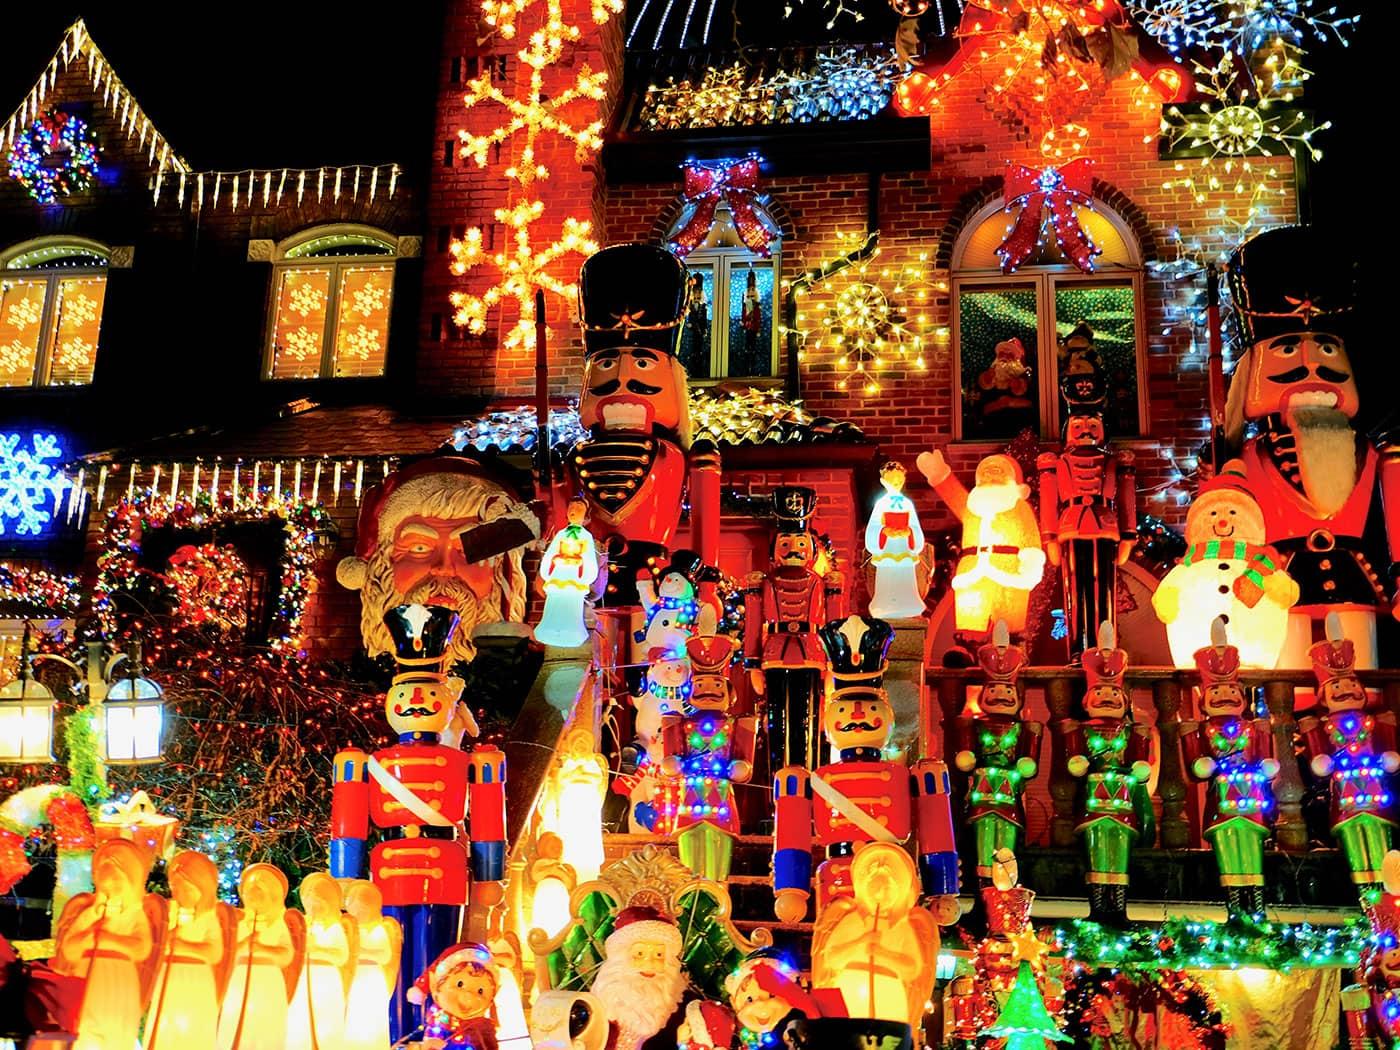 Dyker Heights Christmas Lights - Figures